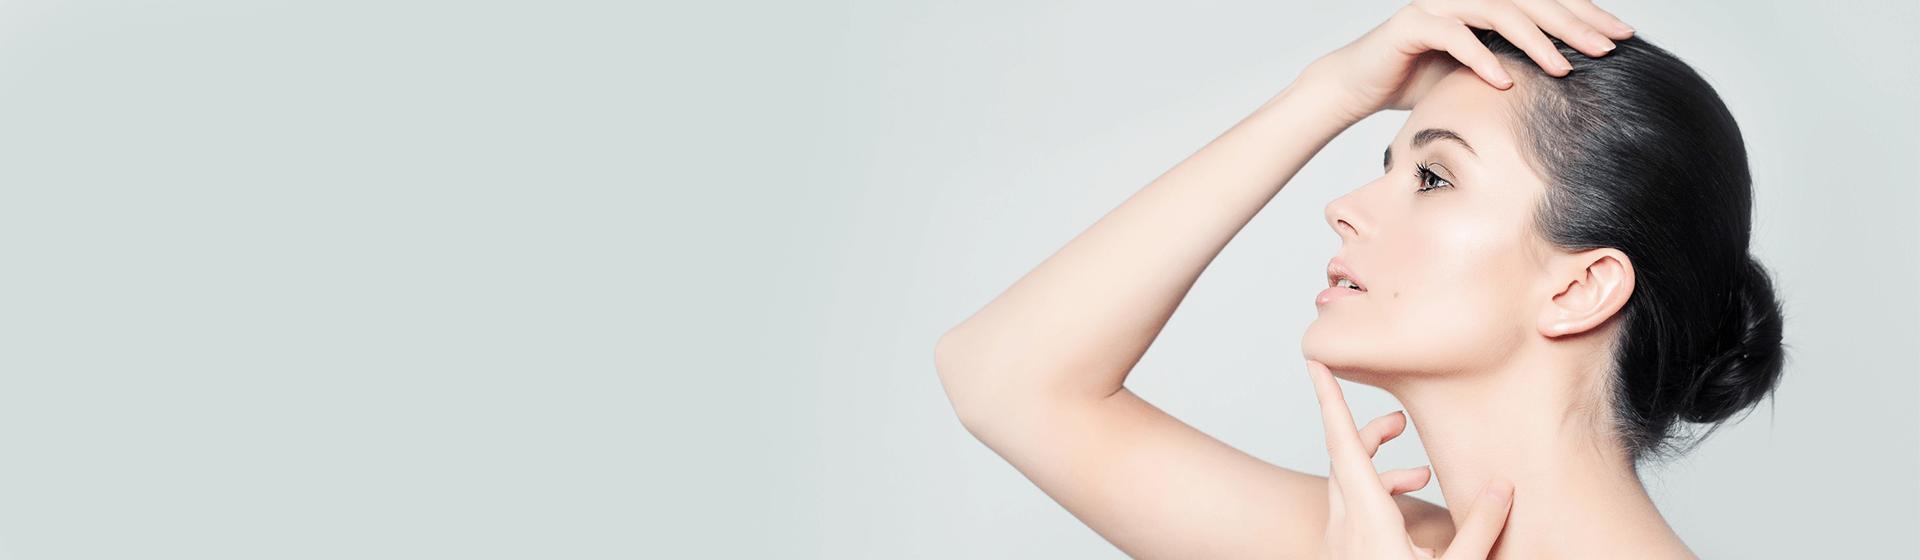 AL-Masa-12-Feb-Our-Services-SkinCare-option-4